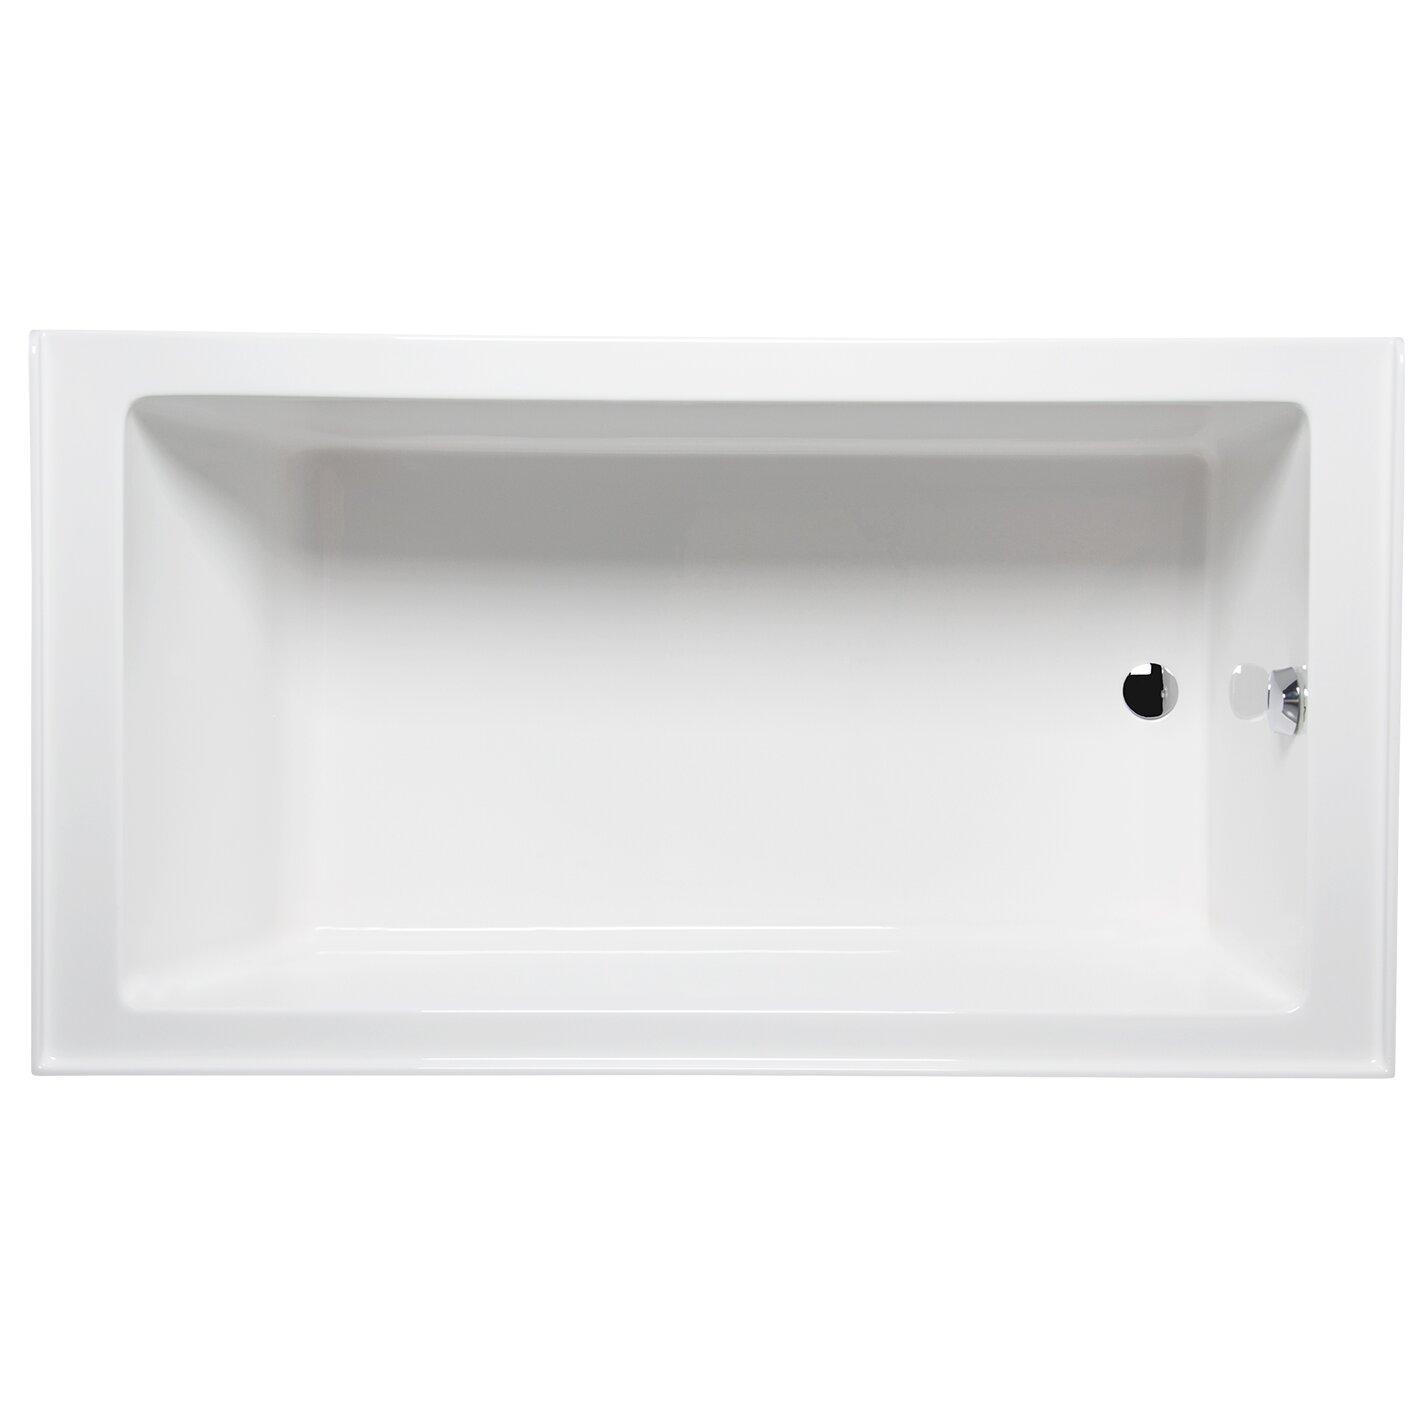 Americh Turo 60 x 30 Soaking Bathtub